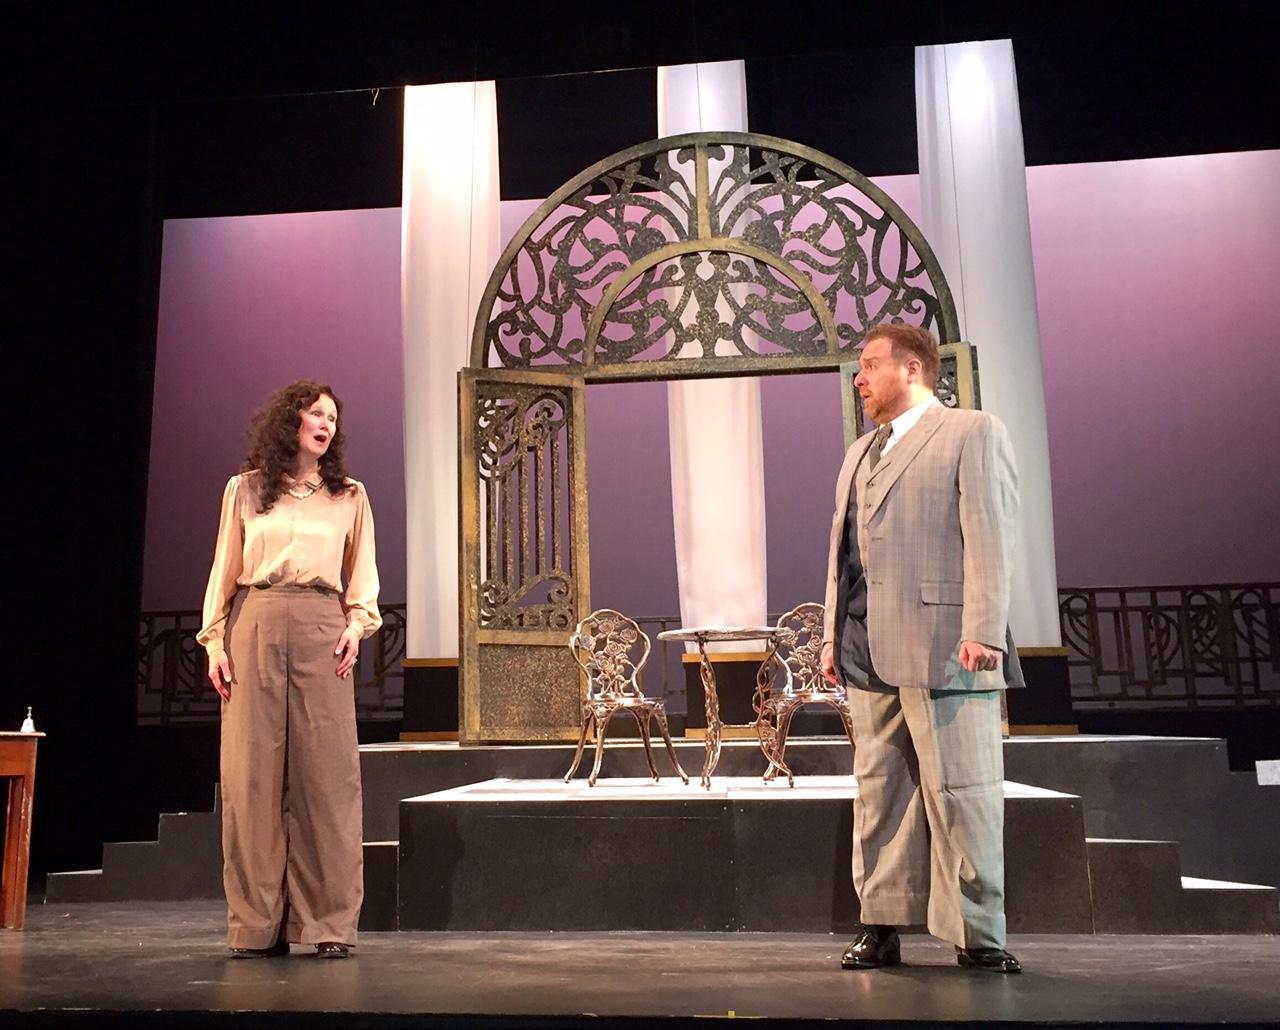 IN PERFORMANCE: Soprano AMY COFIELD WILLIAMSON as Violetta (left) and baritone LEVI HERNANDEZ as Germont (right) in Opera Roanoke's production of Giuseppe Verdi's LA TRAVIATA, April 2016 [Photo by Scott Williamson; used with permission]